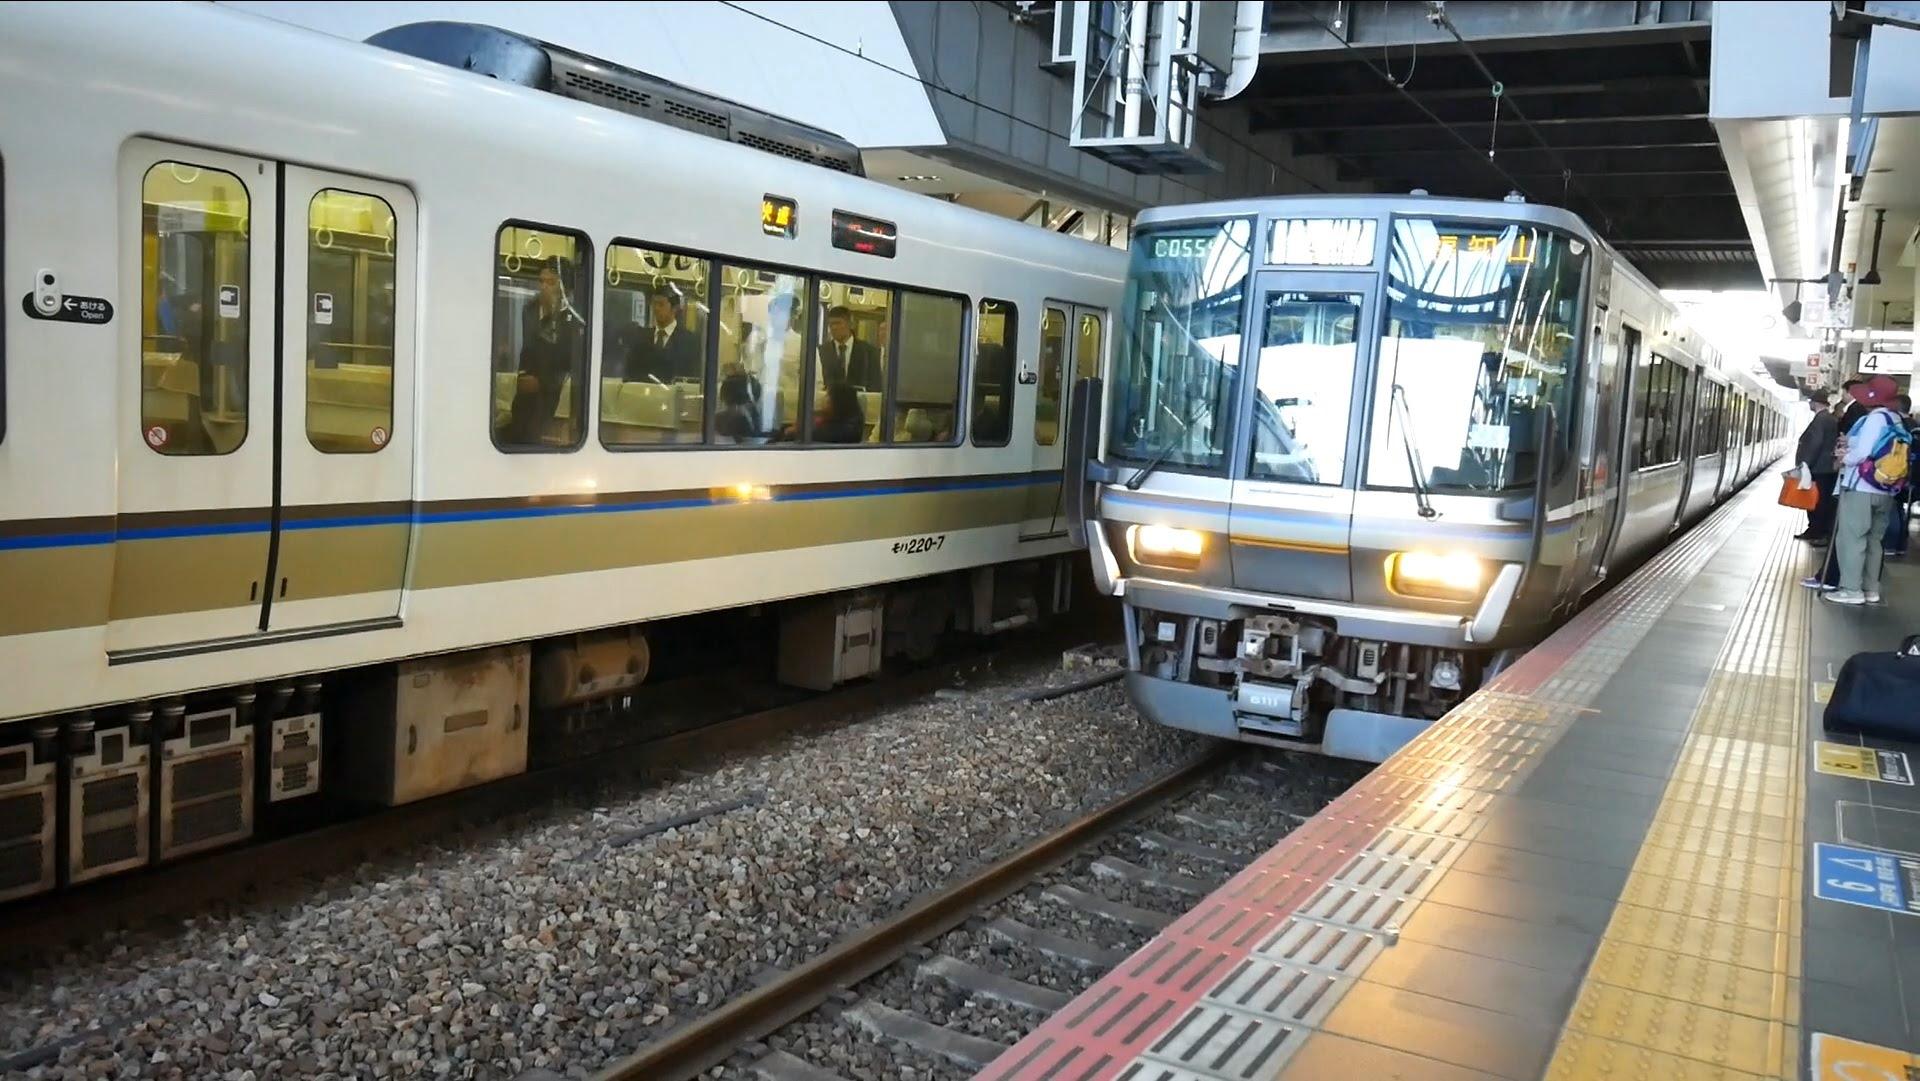 JR西日本 丹波路快速 (223系6000番台運行) 超広角車窓 進行右側 大阪~福知山 (Panasonic DMC-G7 撮影テスト)